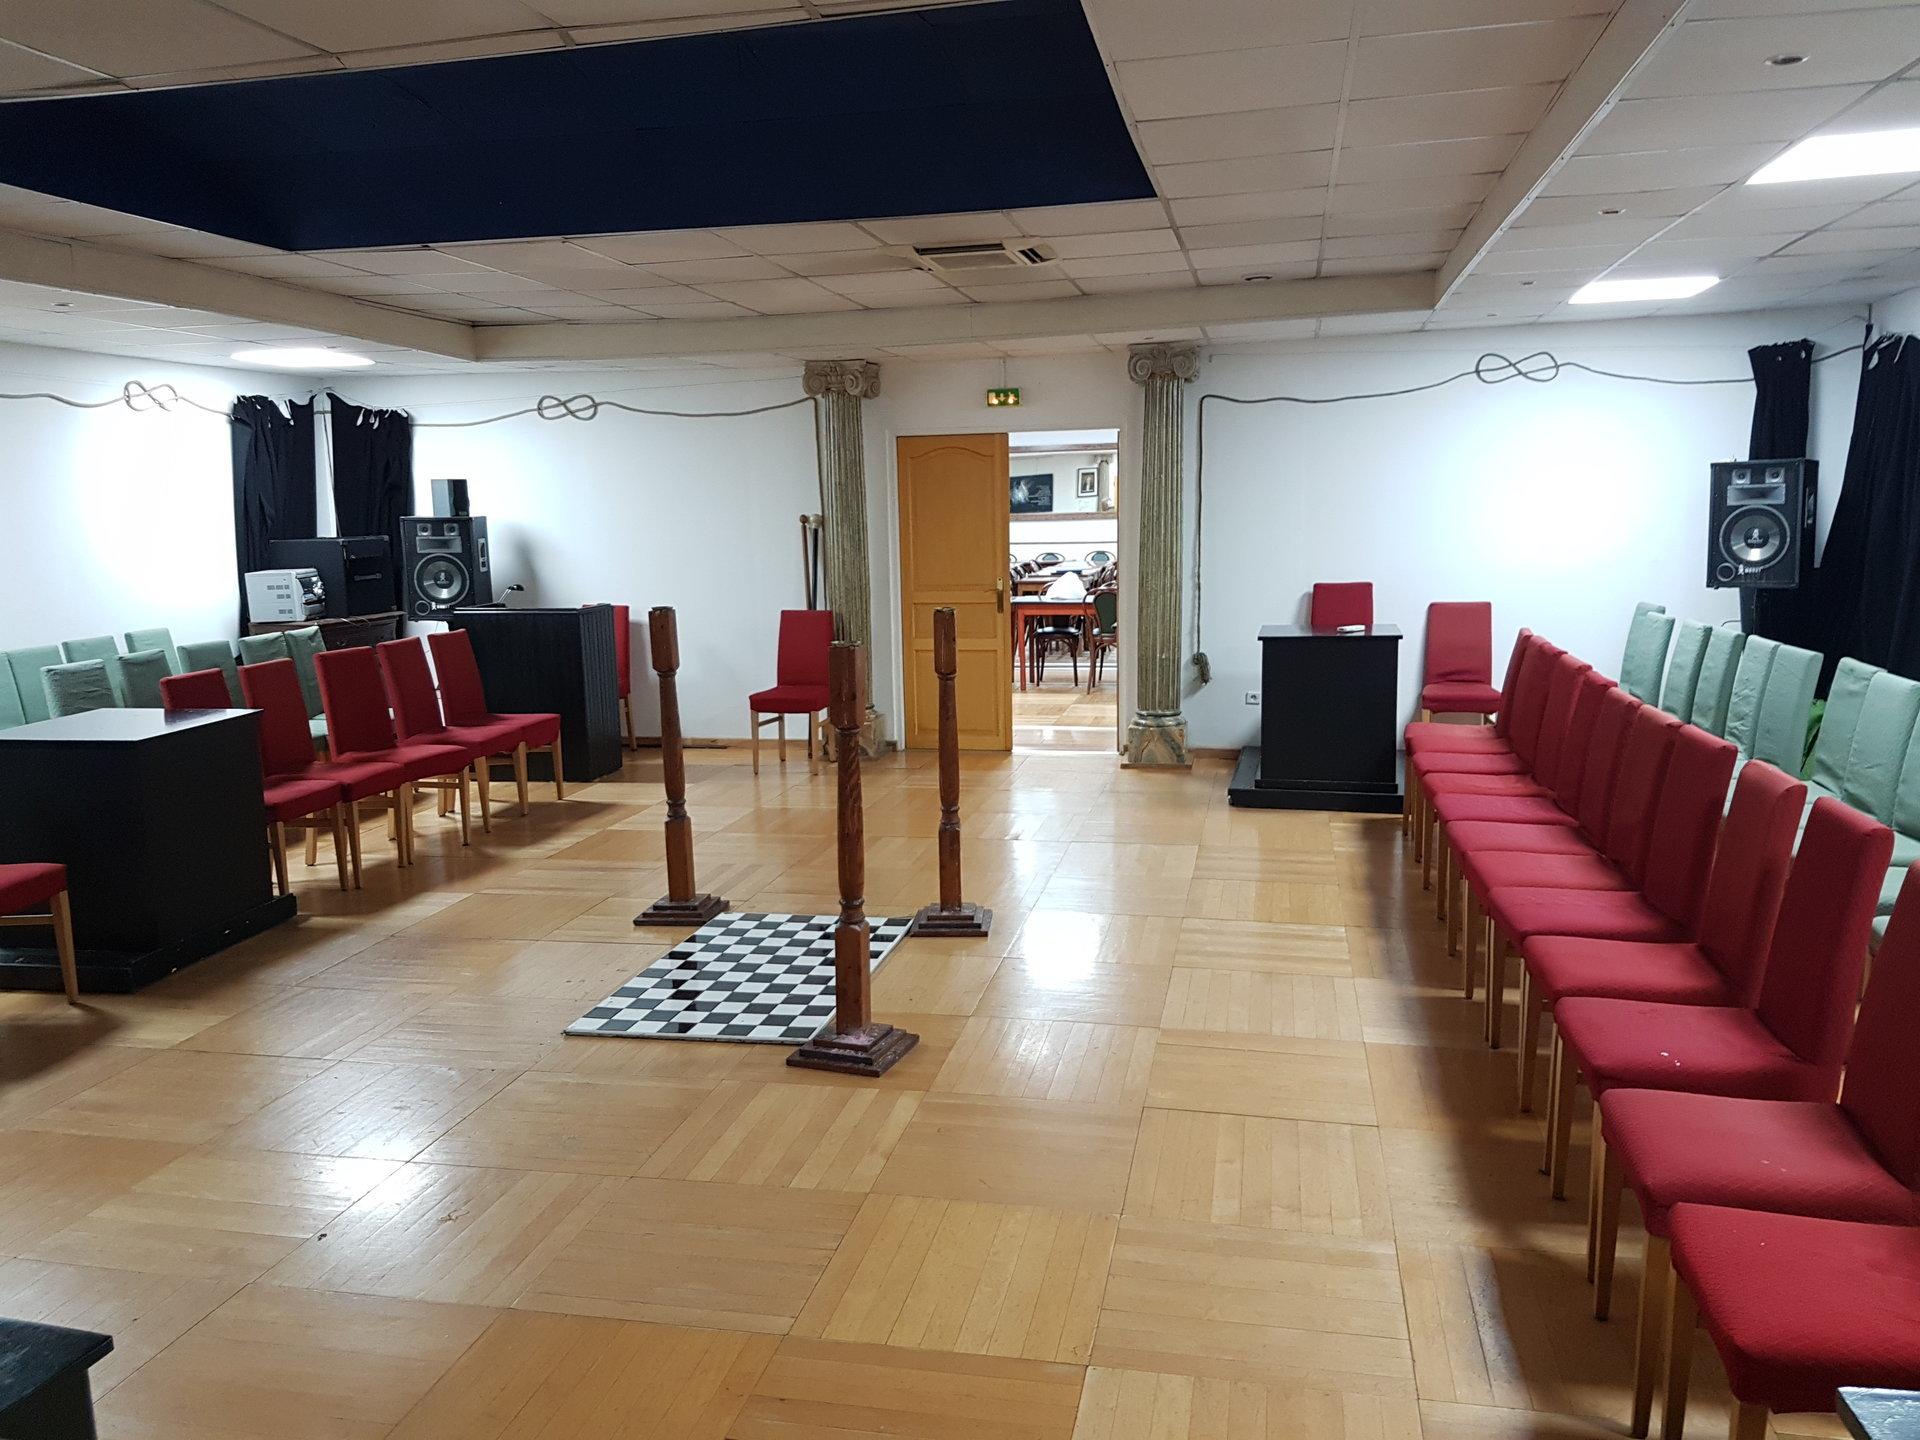 ALPES MARITIMES (06) NICE ST SYLVESTRE VENTE IMMEUBLE 380 m2